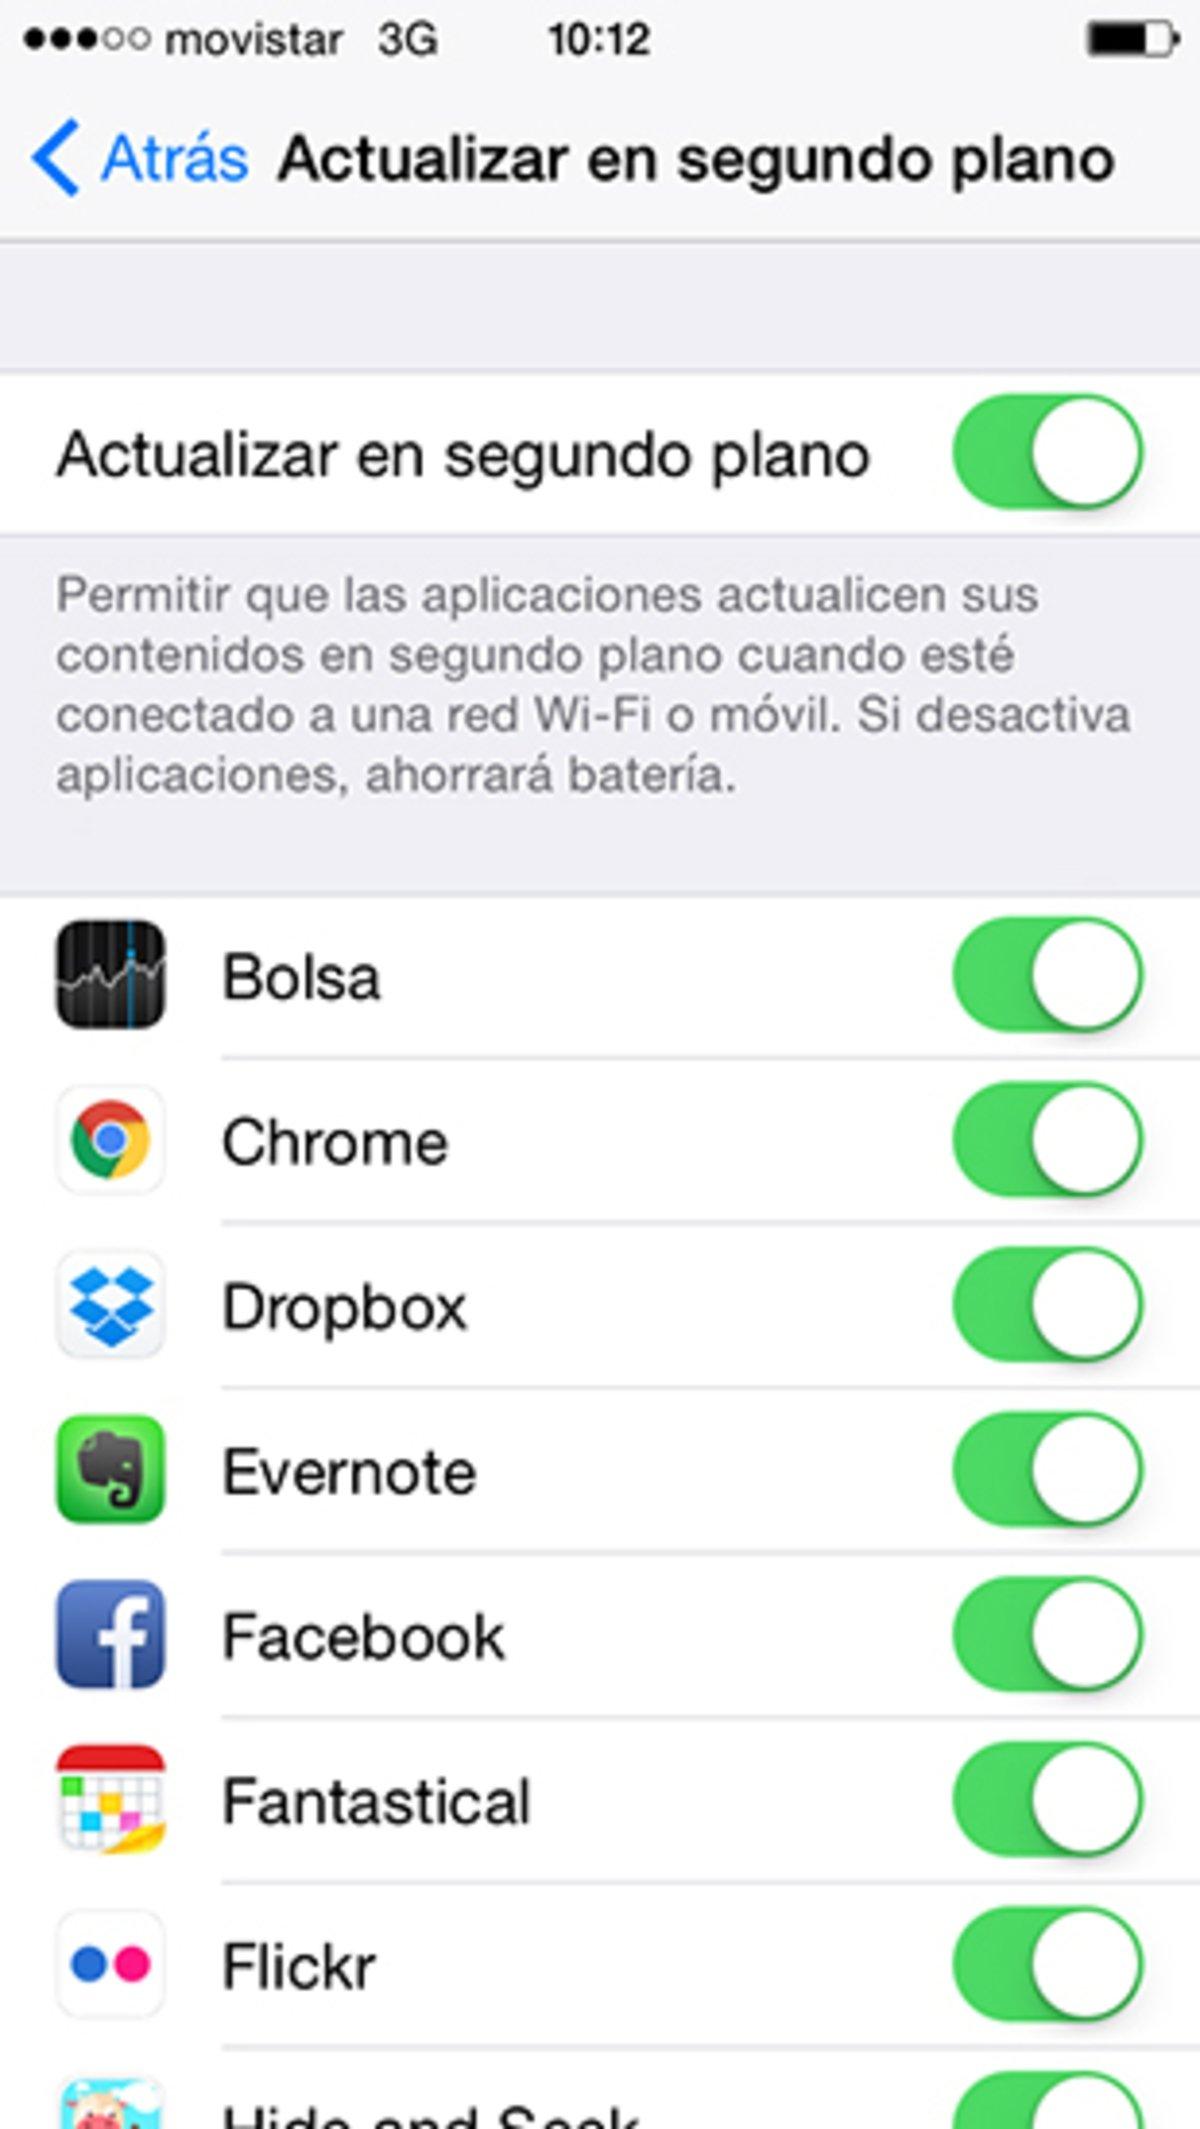 gestionar-permisos-apps-iphone-ipad-6